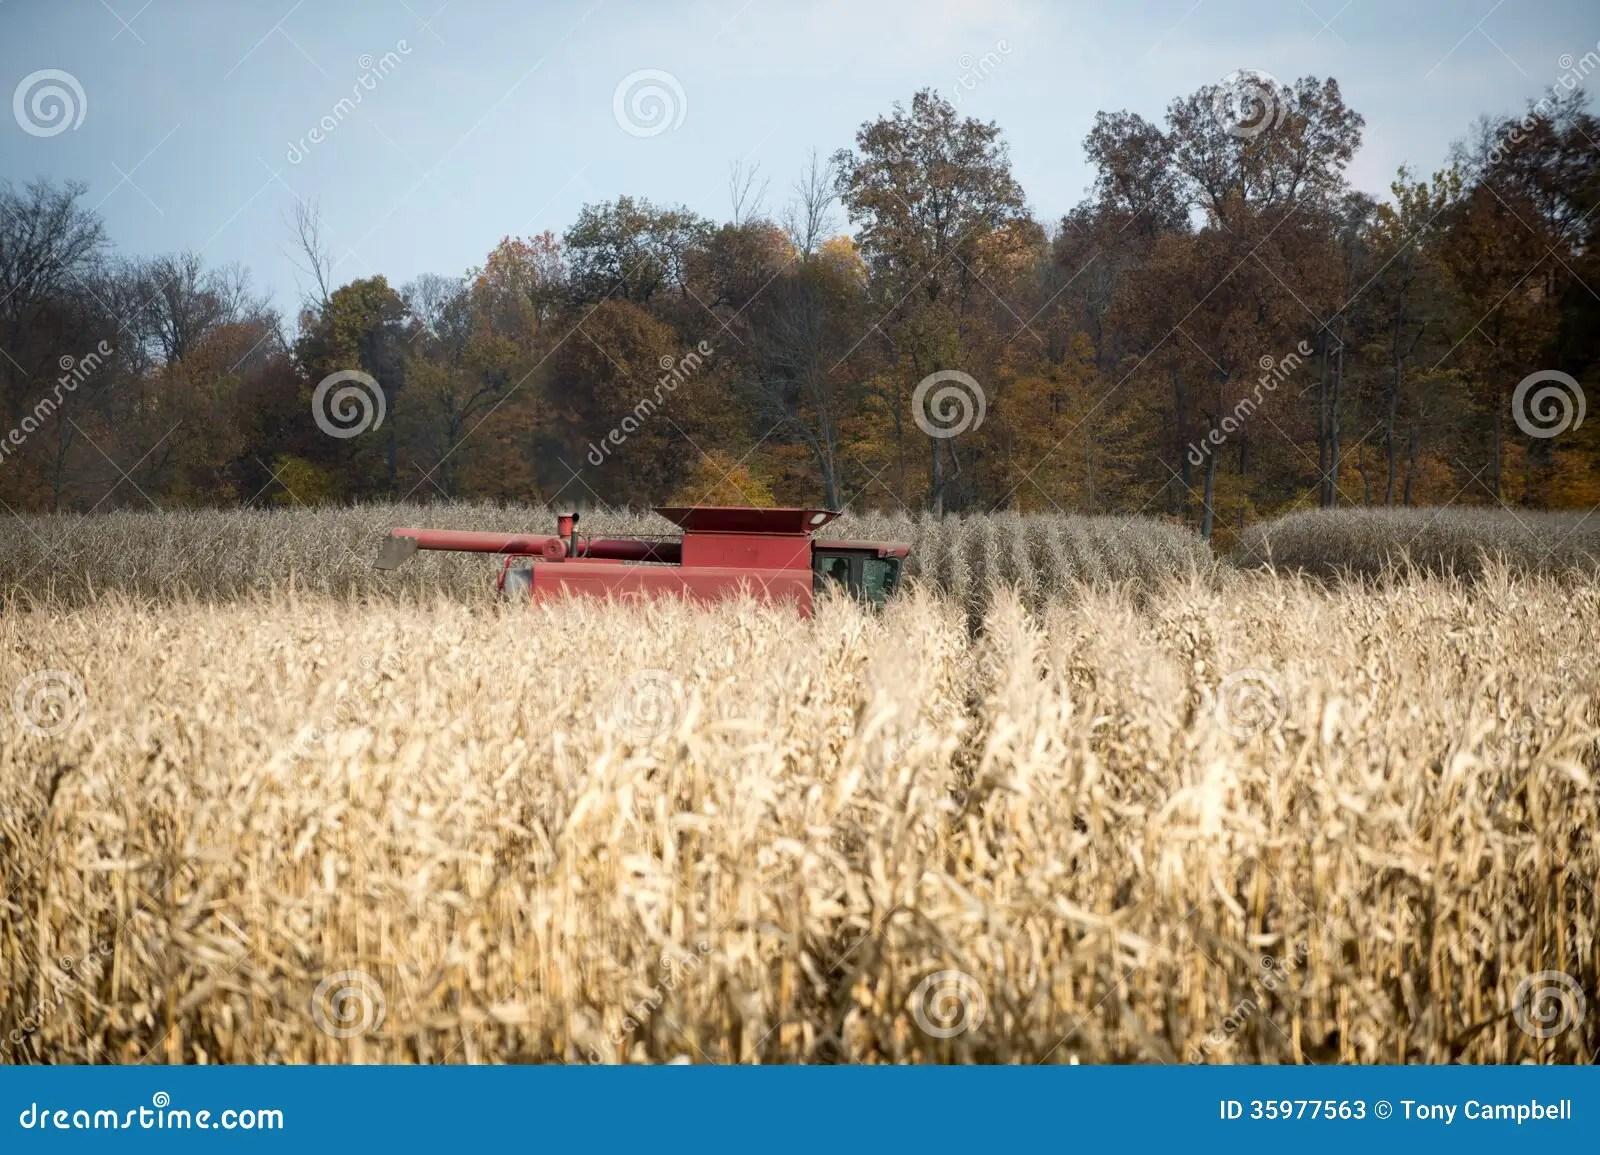 Corn Field And Corn In Wagon Cartoon Vector